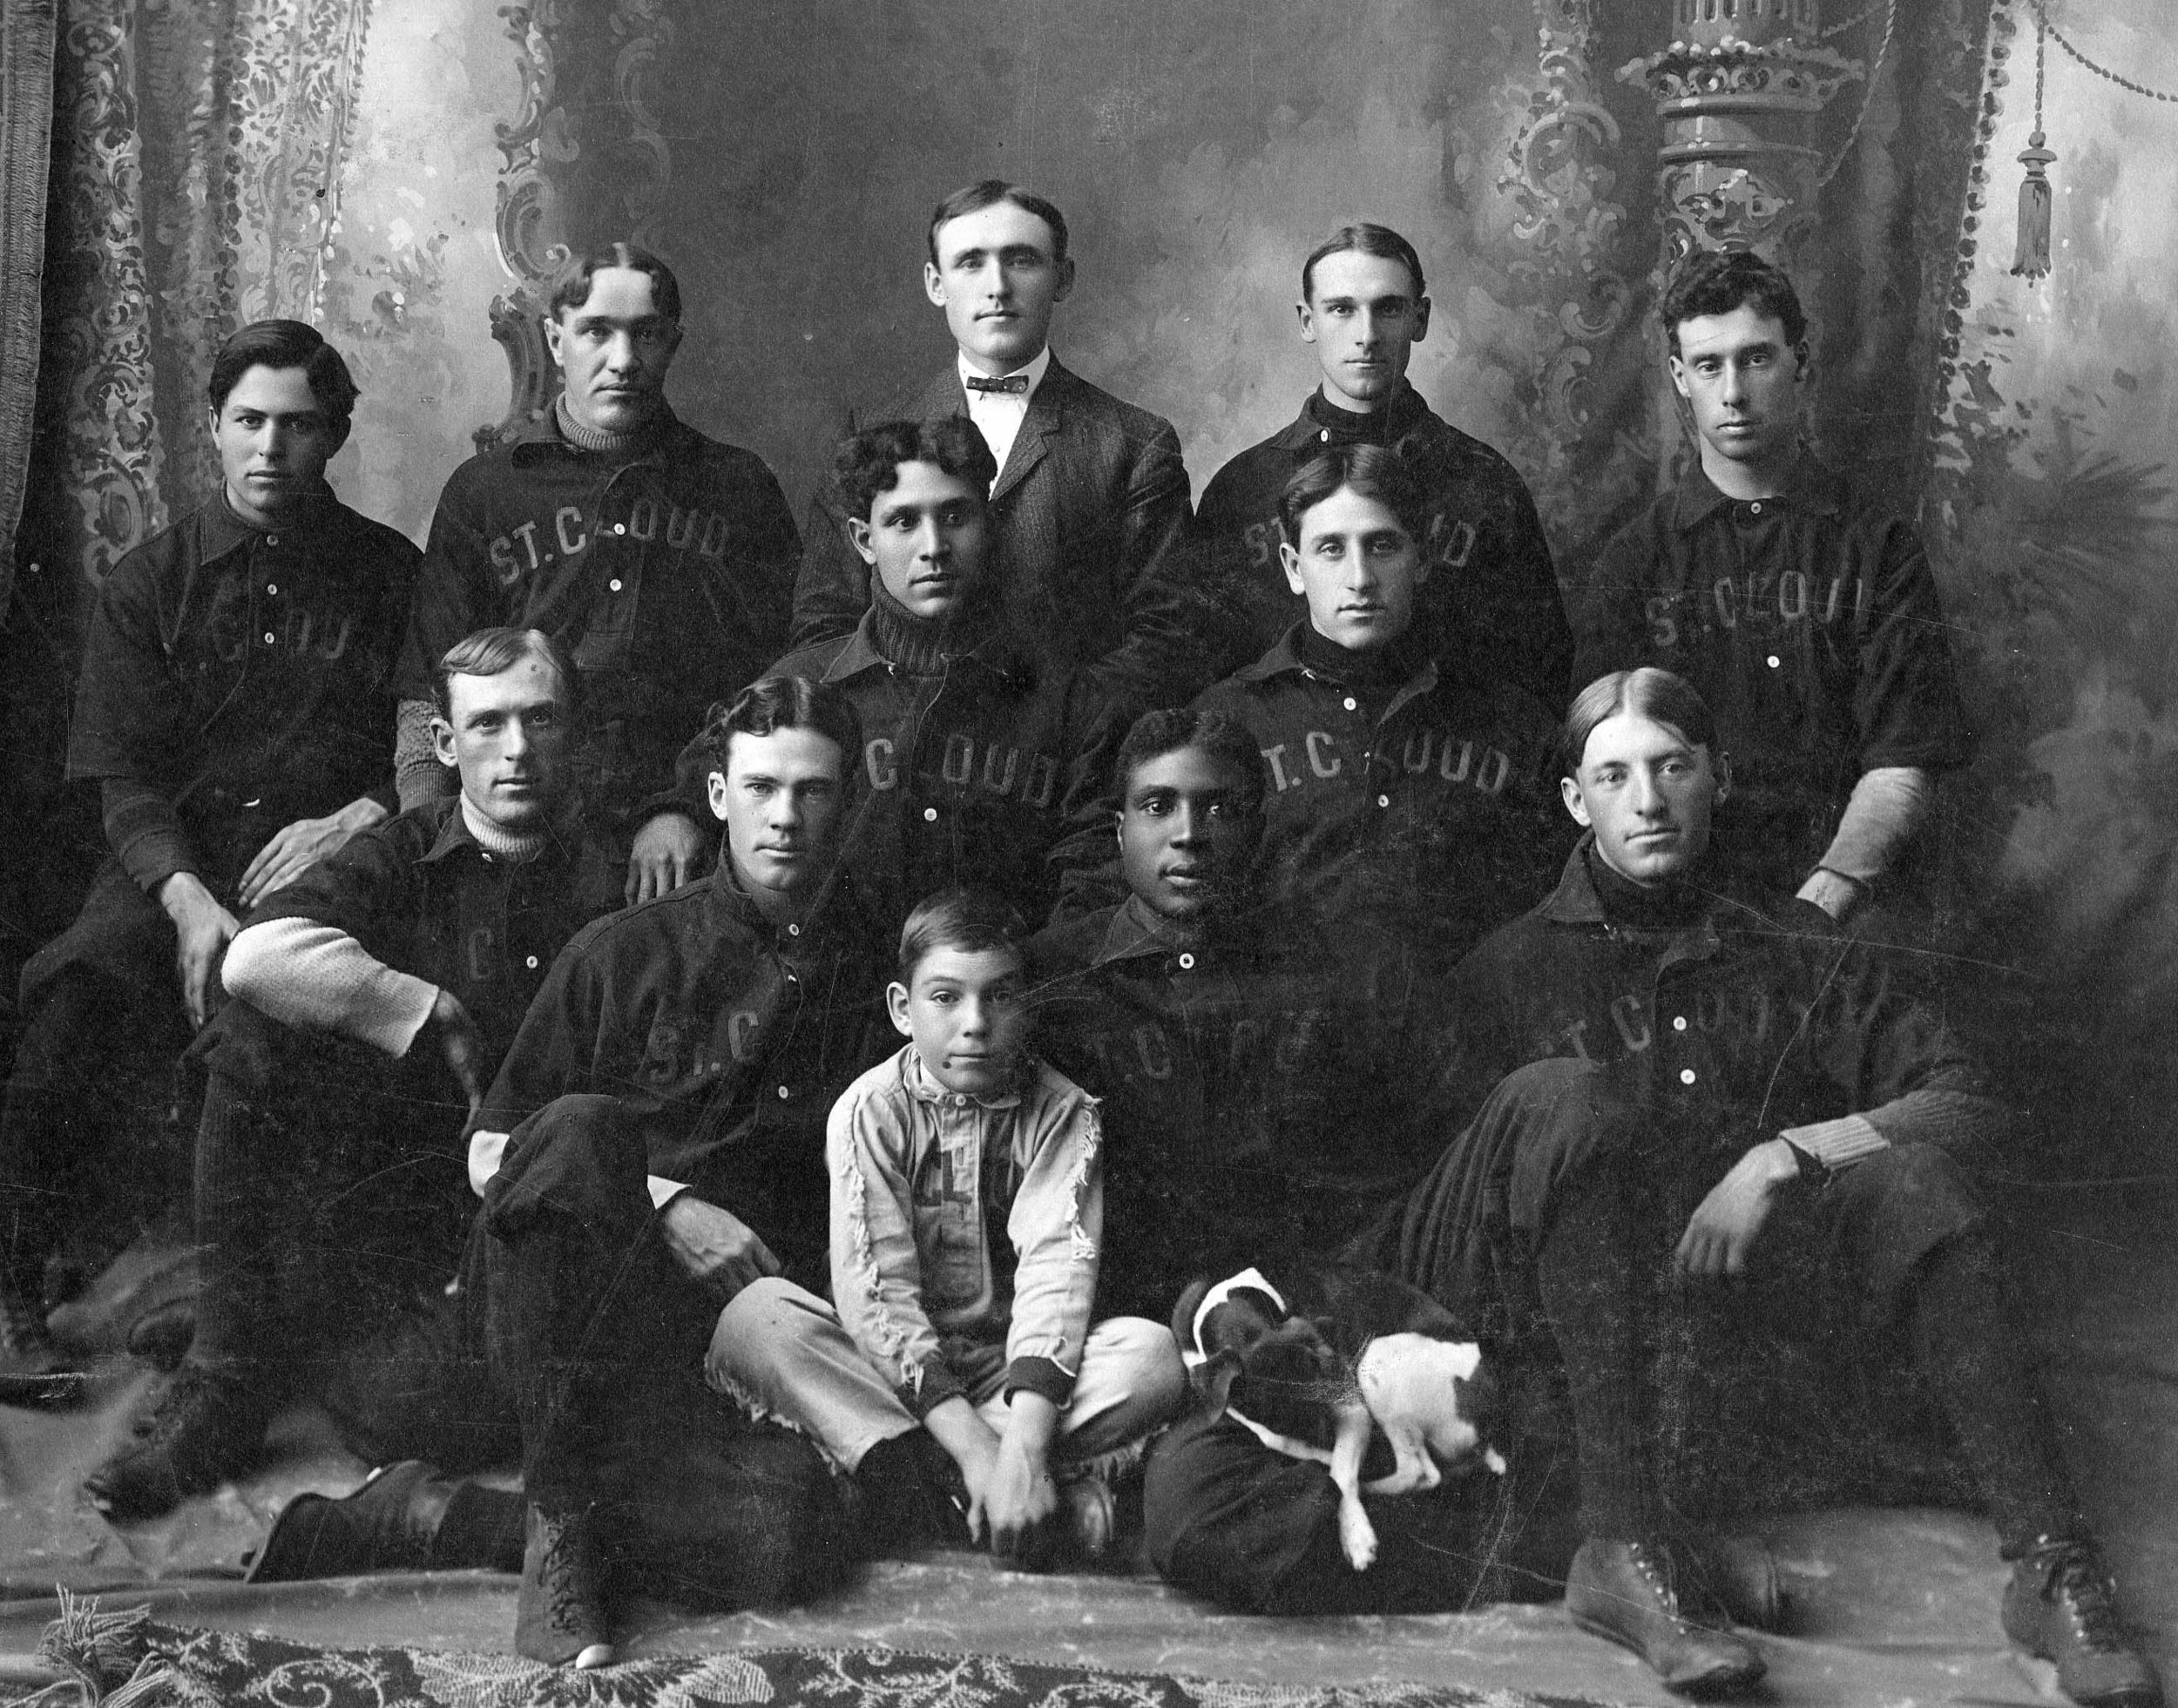 A8837 George Wilson member St Cloud baseball team 1903.jpg